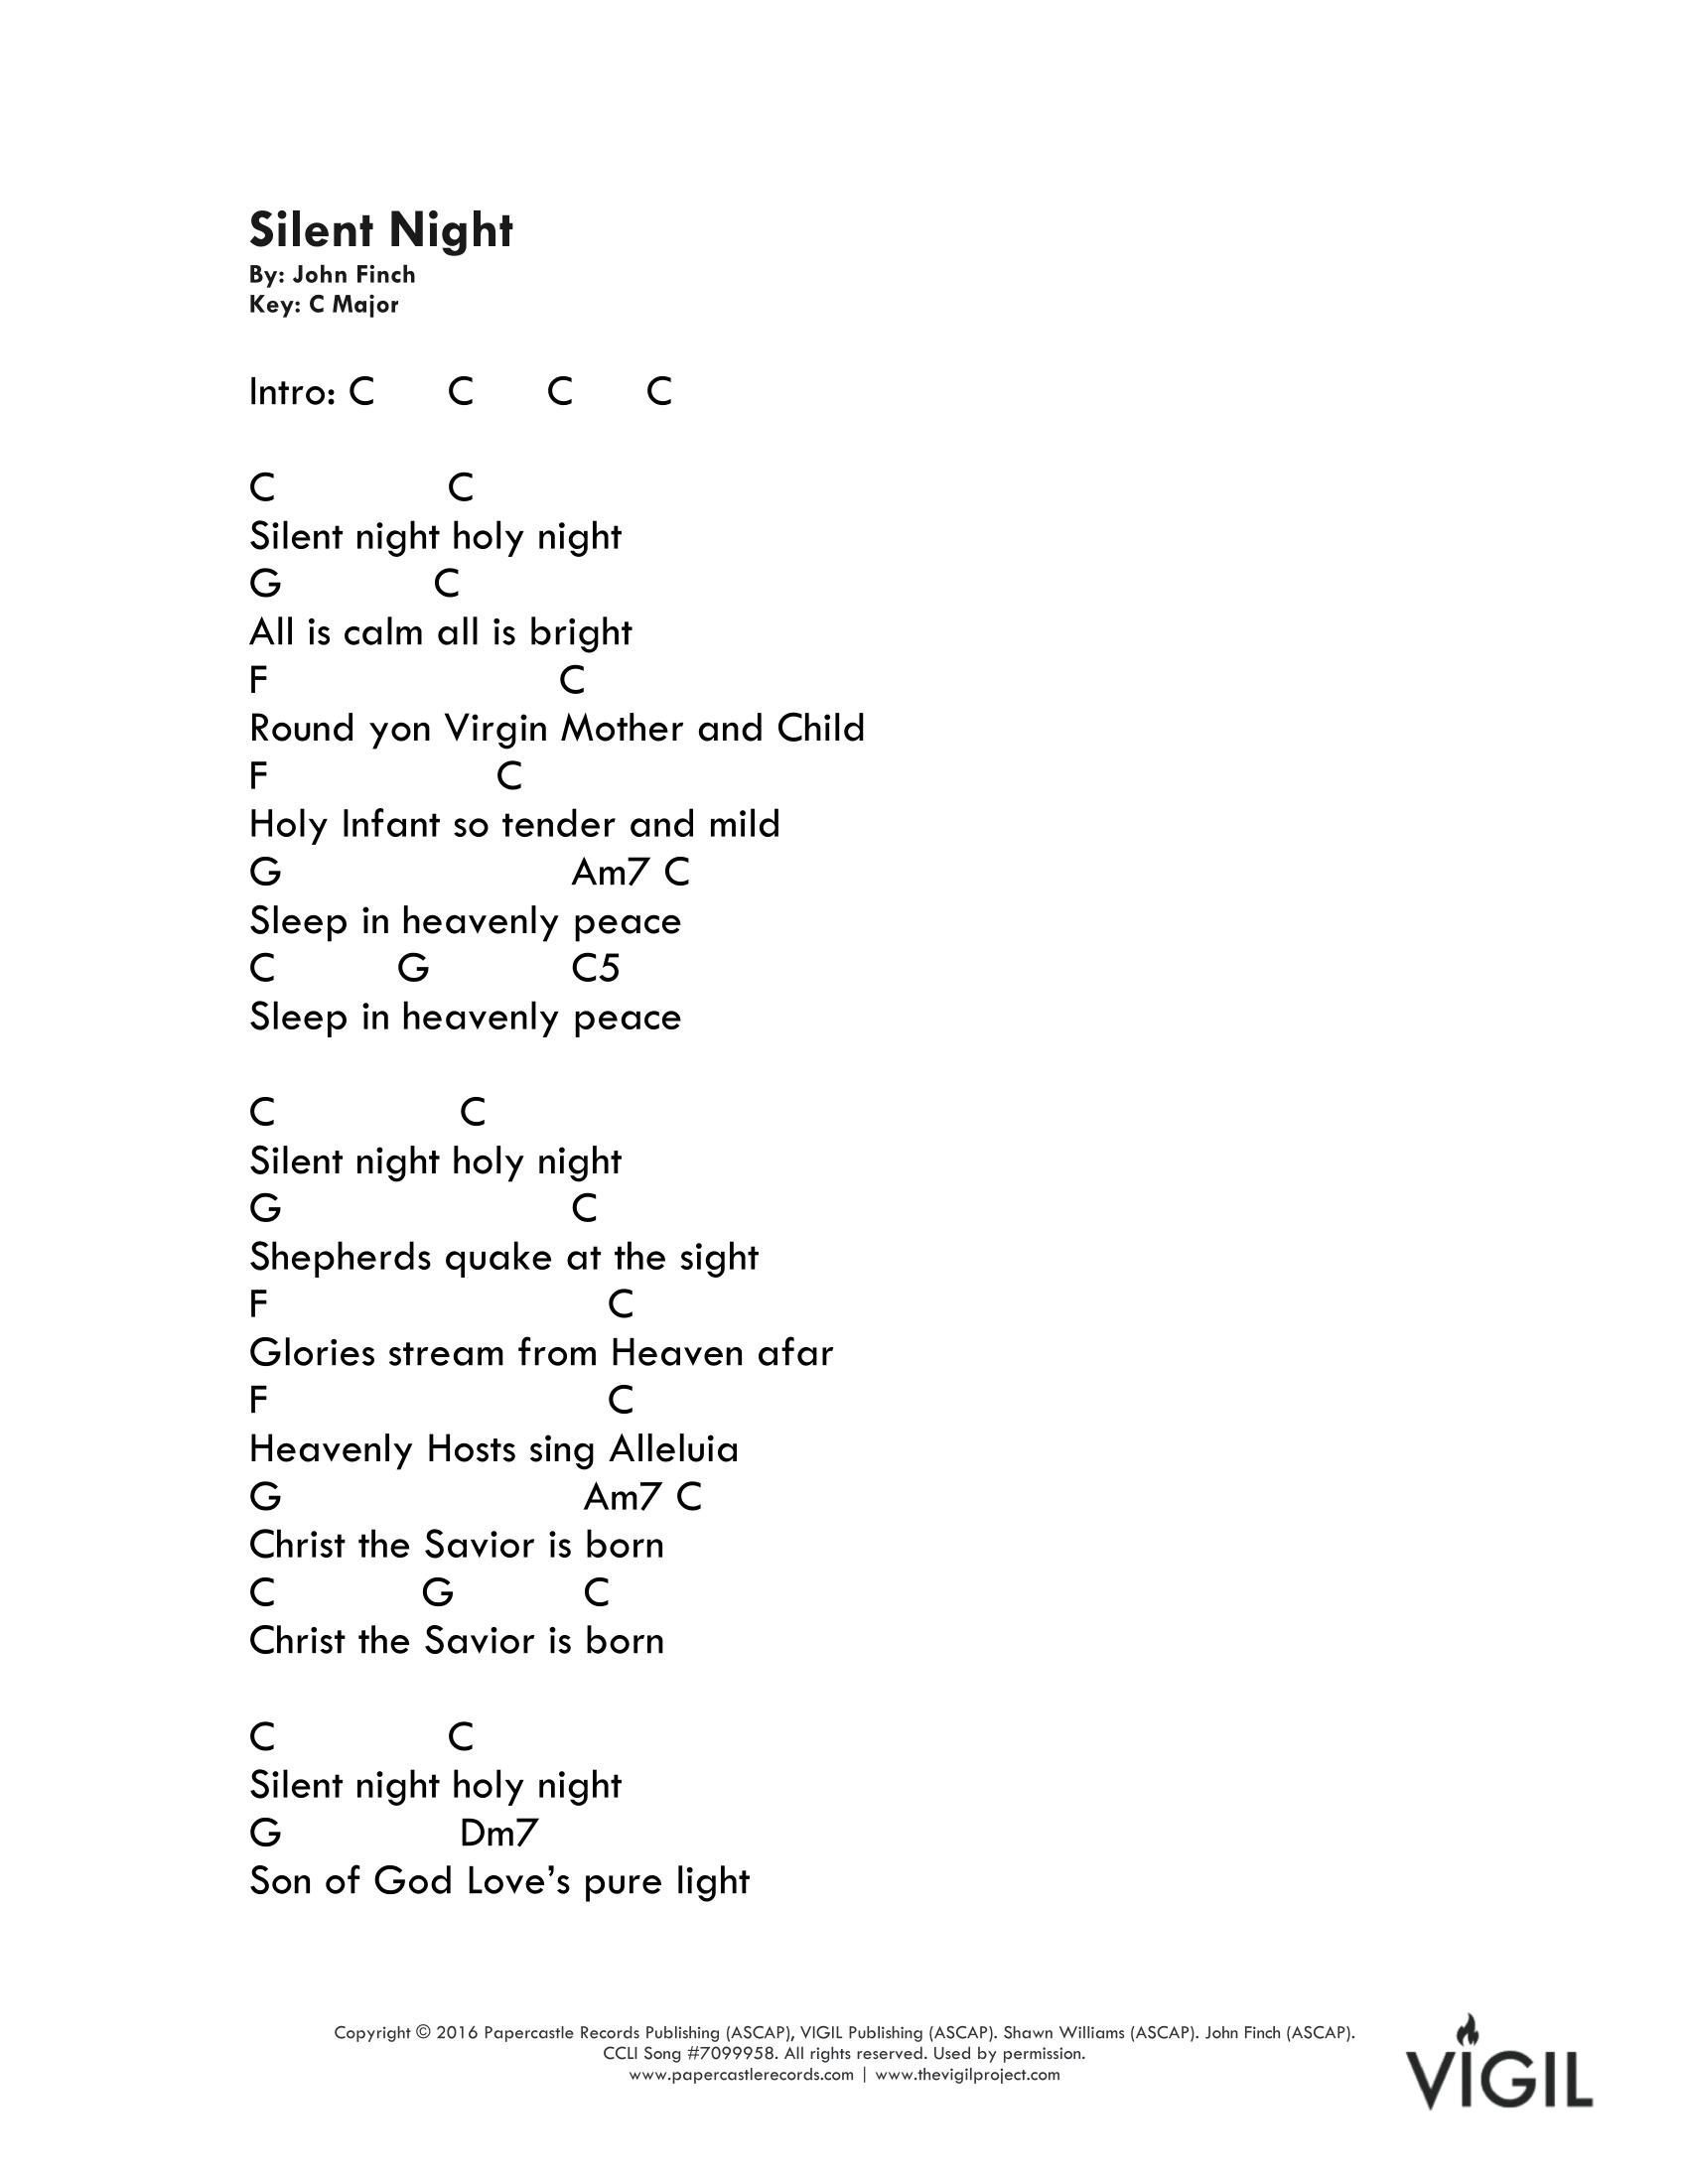 VIGIL S2 - Silent Night (C Major)-1.png